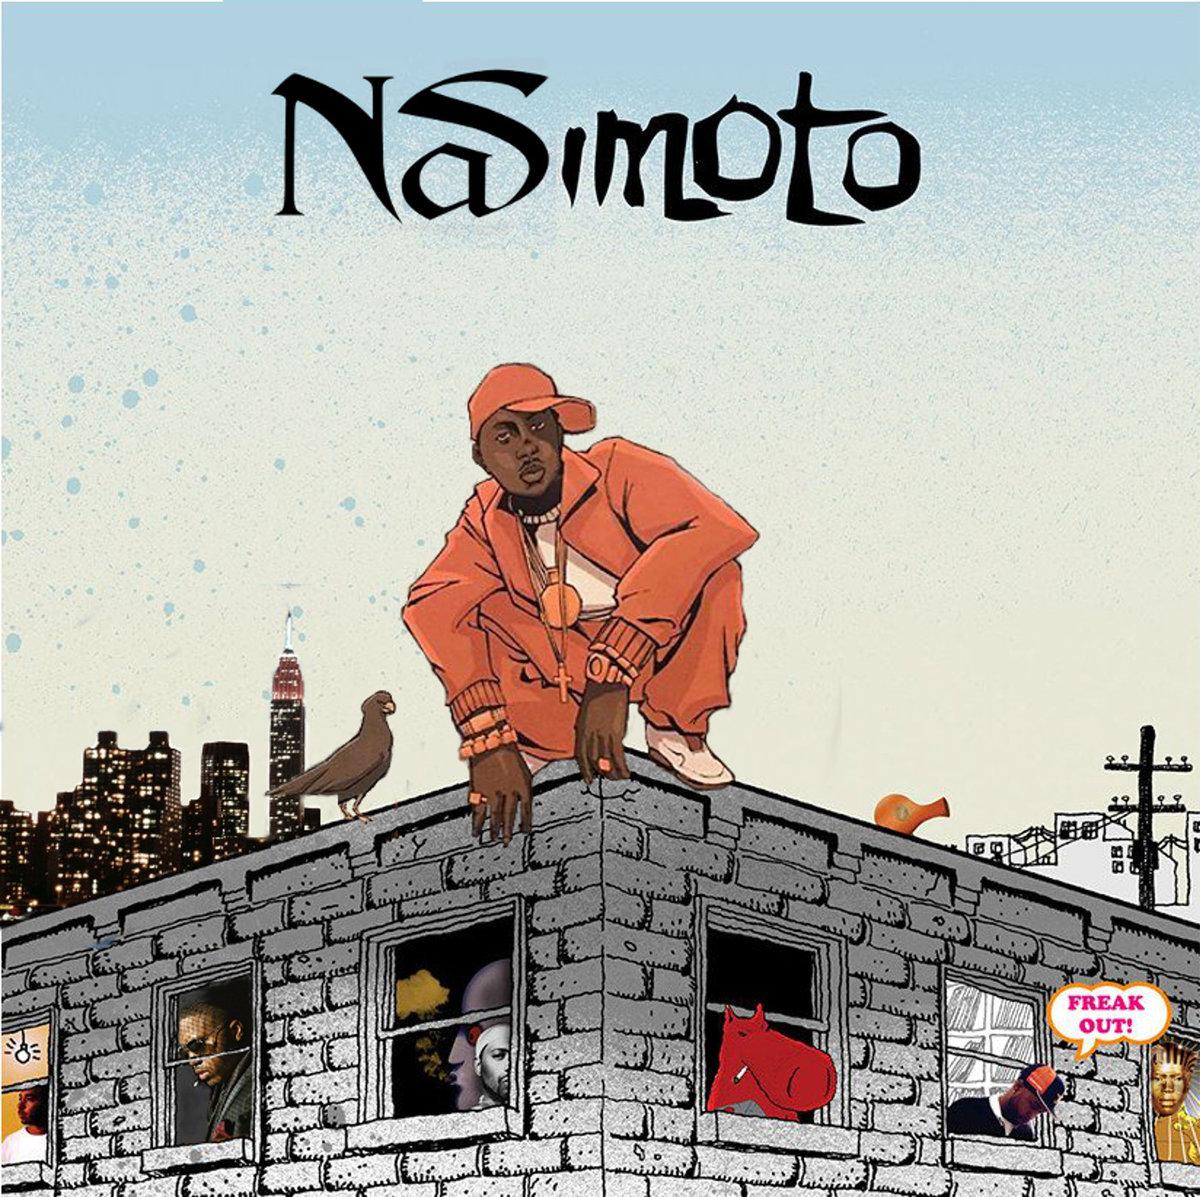 Nasimoto__nas___quasimoto_remix_